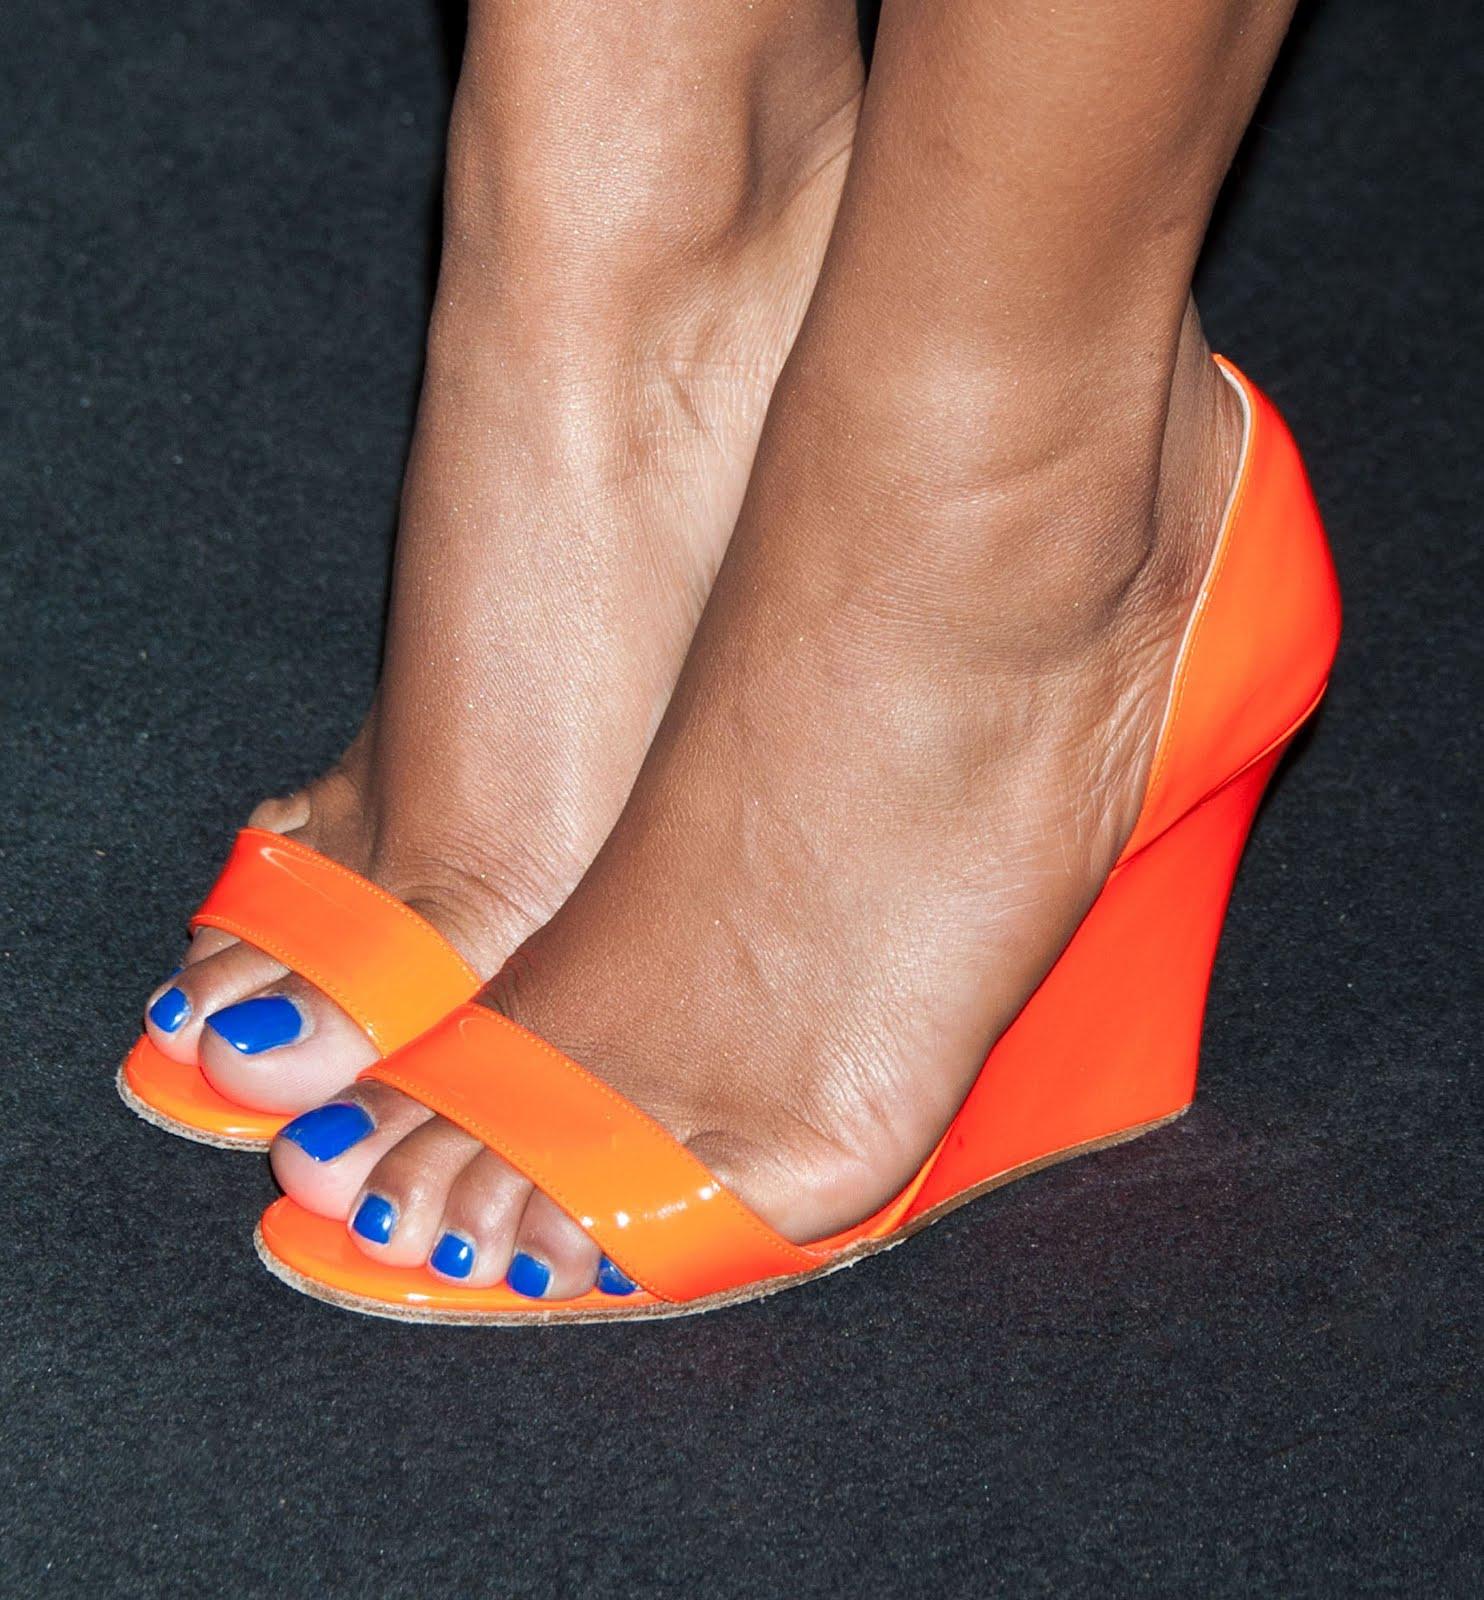 Celebrity Feet: Christina MilianJess Newton